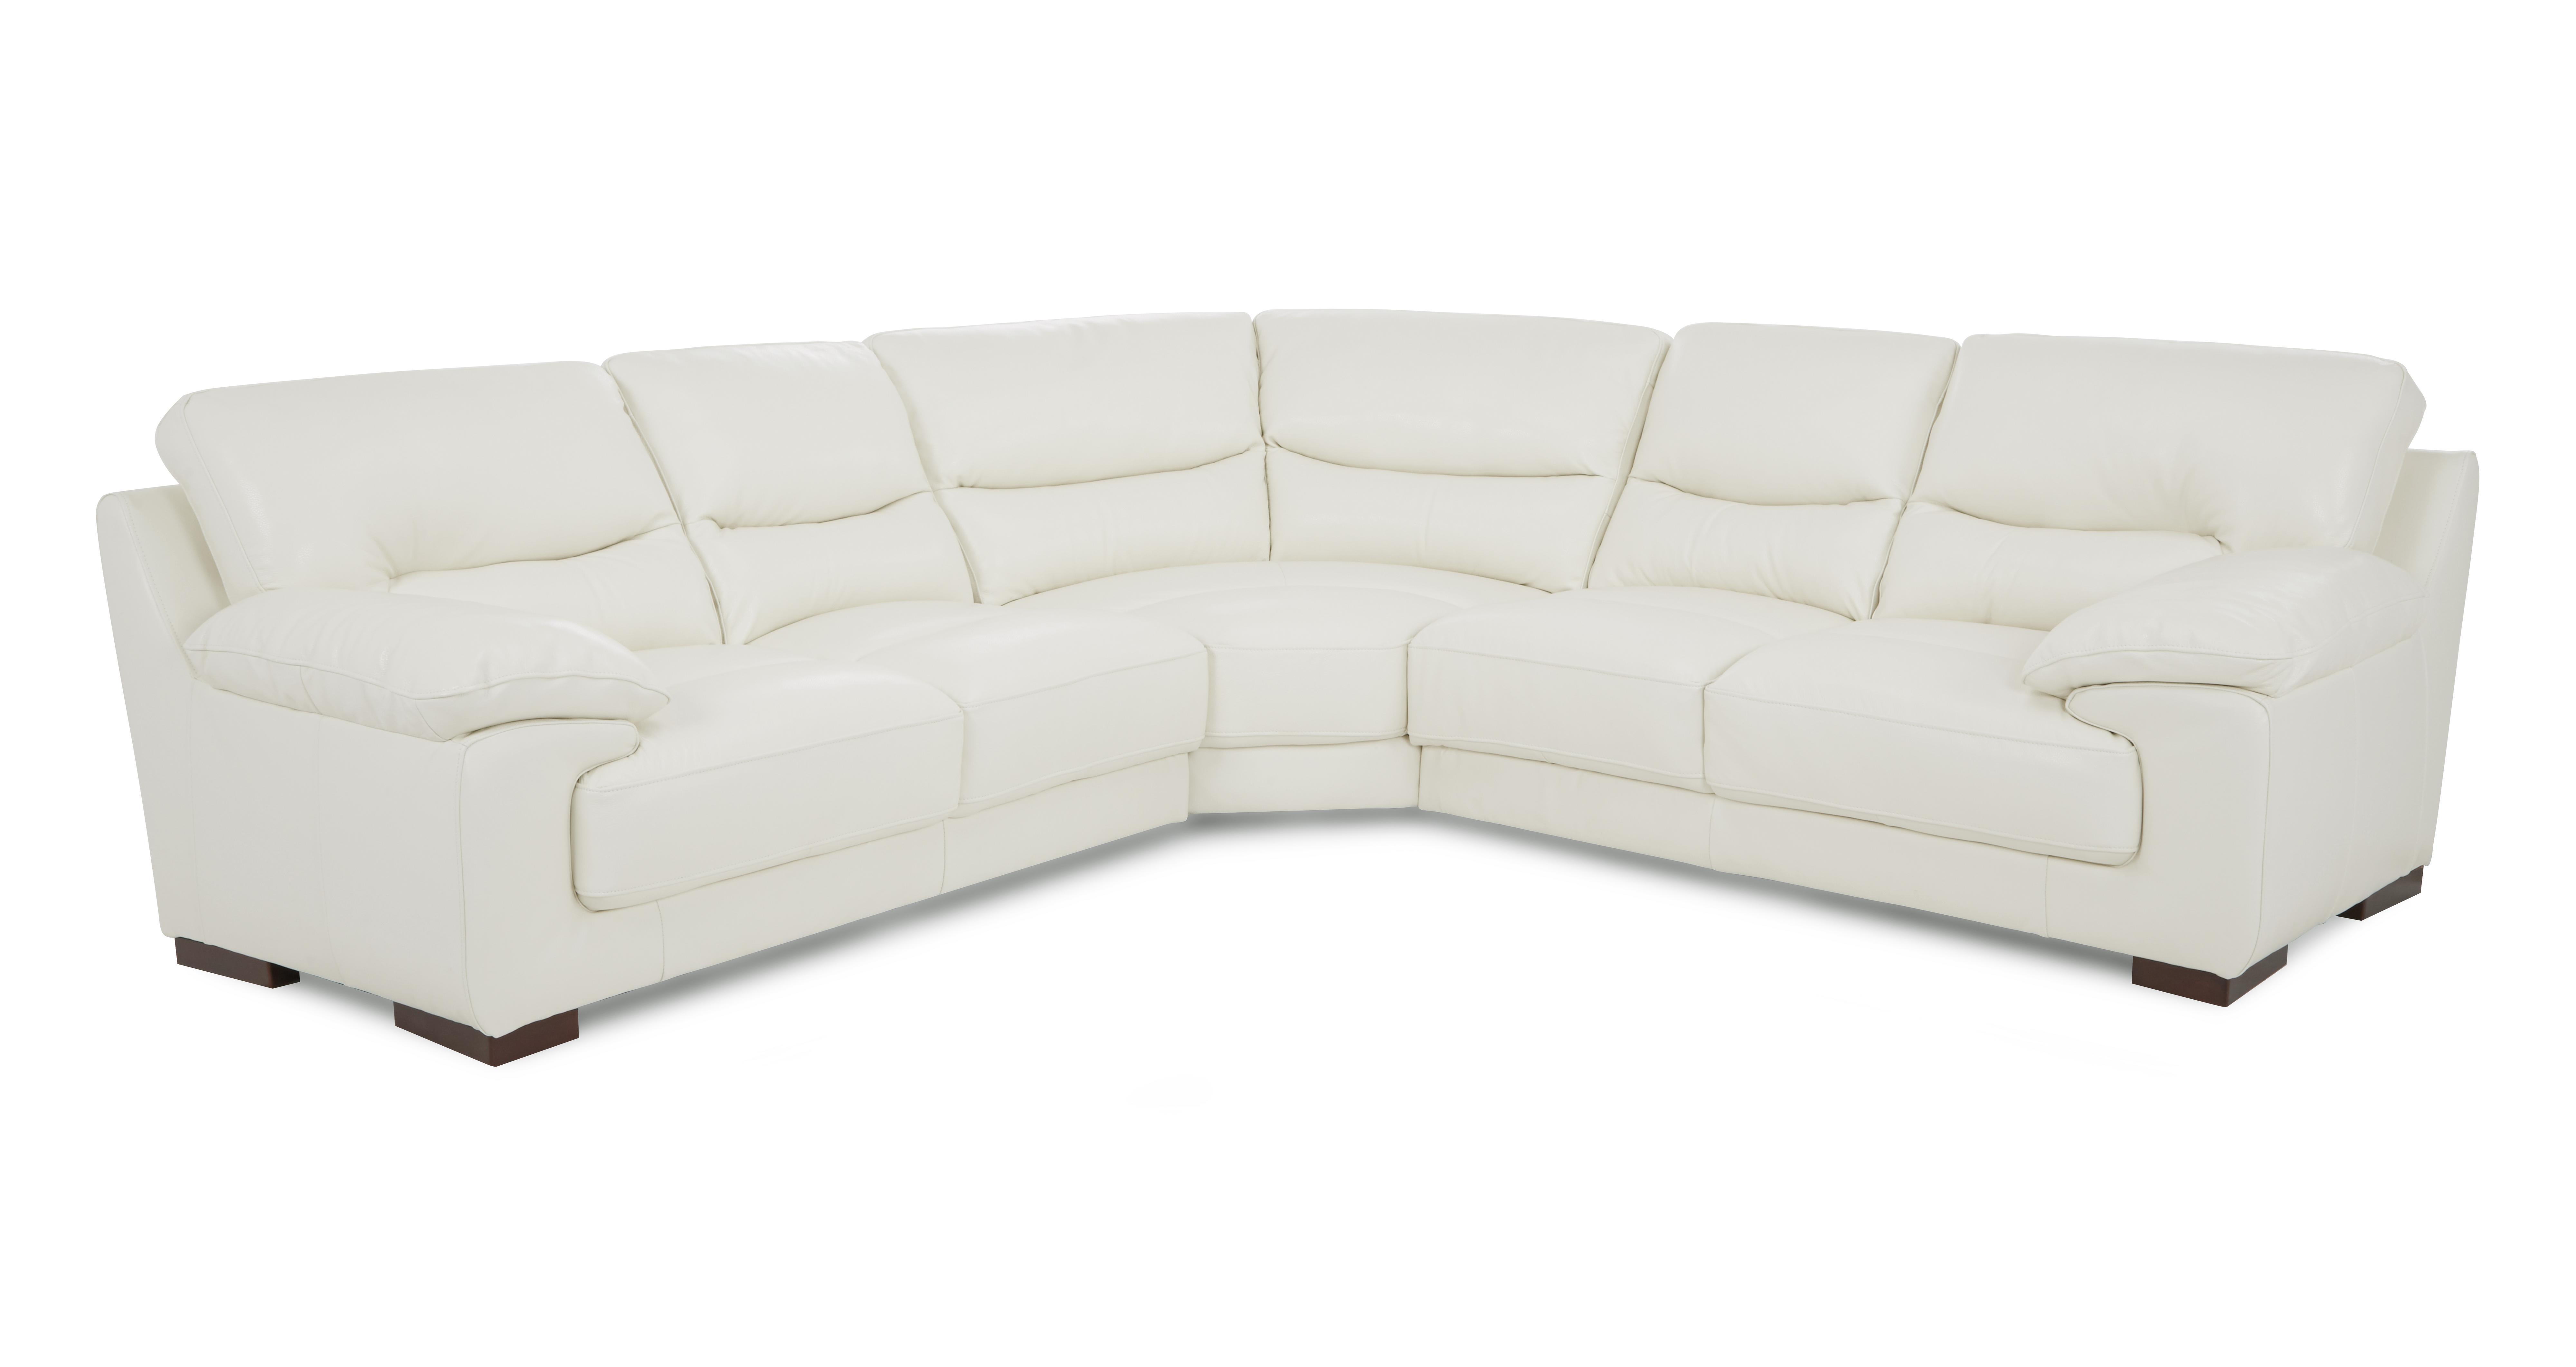 dazzle large corner sofa nevada dfs. Black Bedroom Furniture Sets. Home Design Ideas